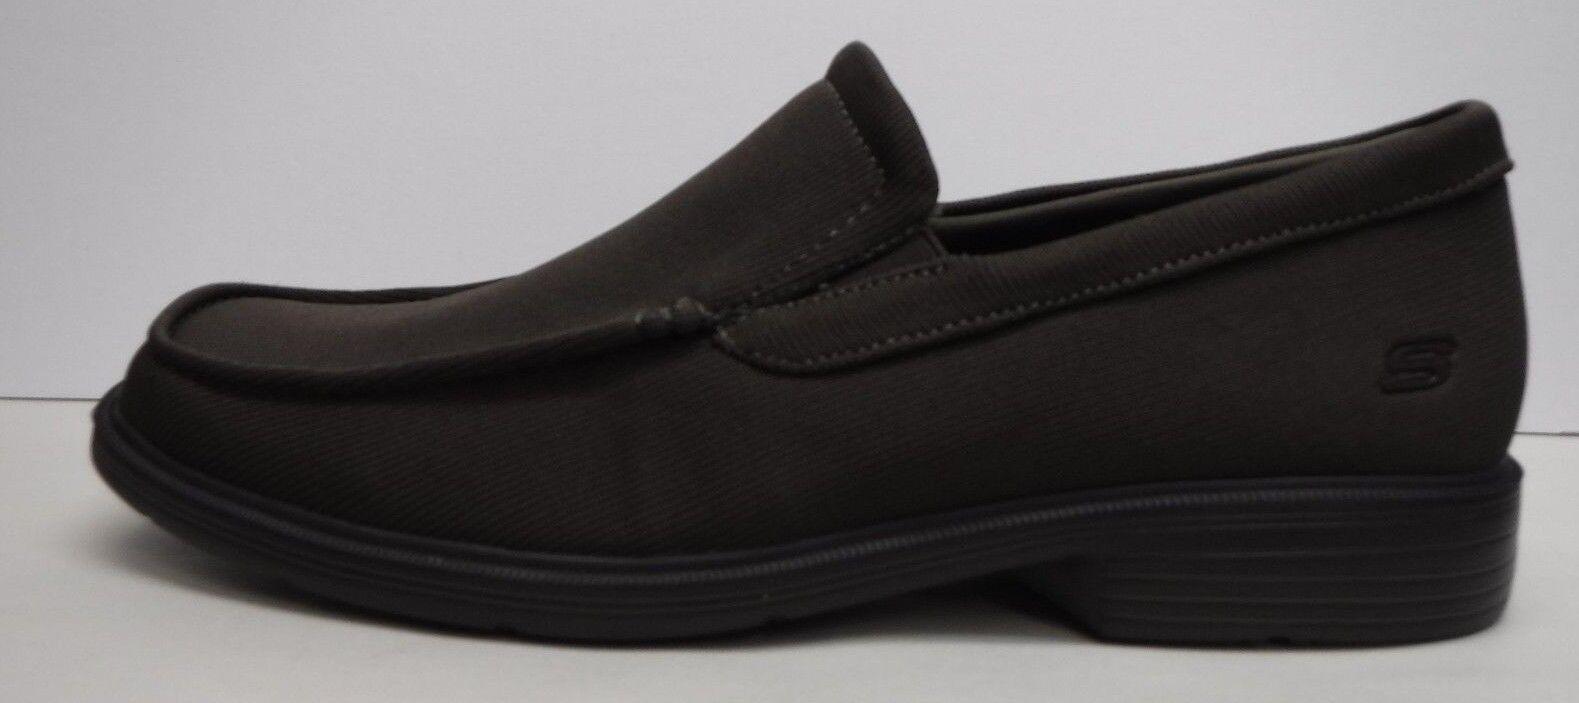 buy uitstekende kwaliteit de nieuwste Skechers Size 12 Brown Dress Knit Loafers New Mens Shoes